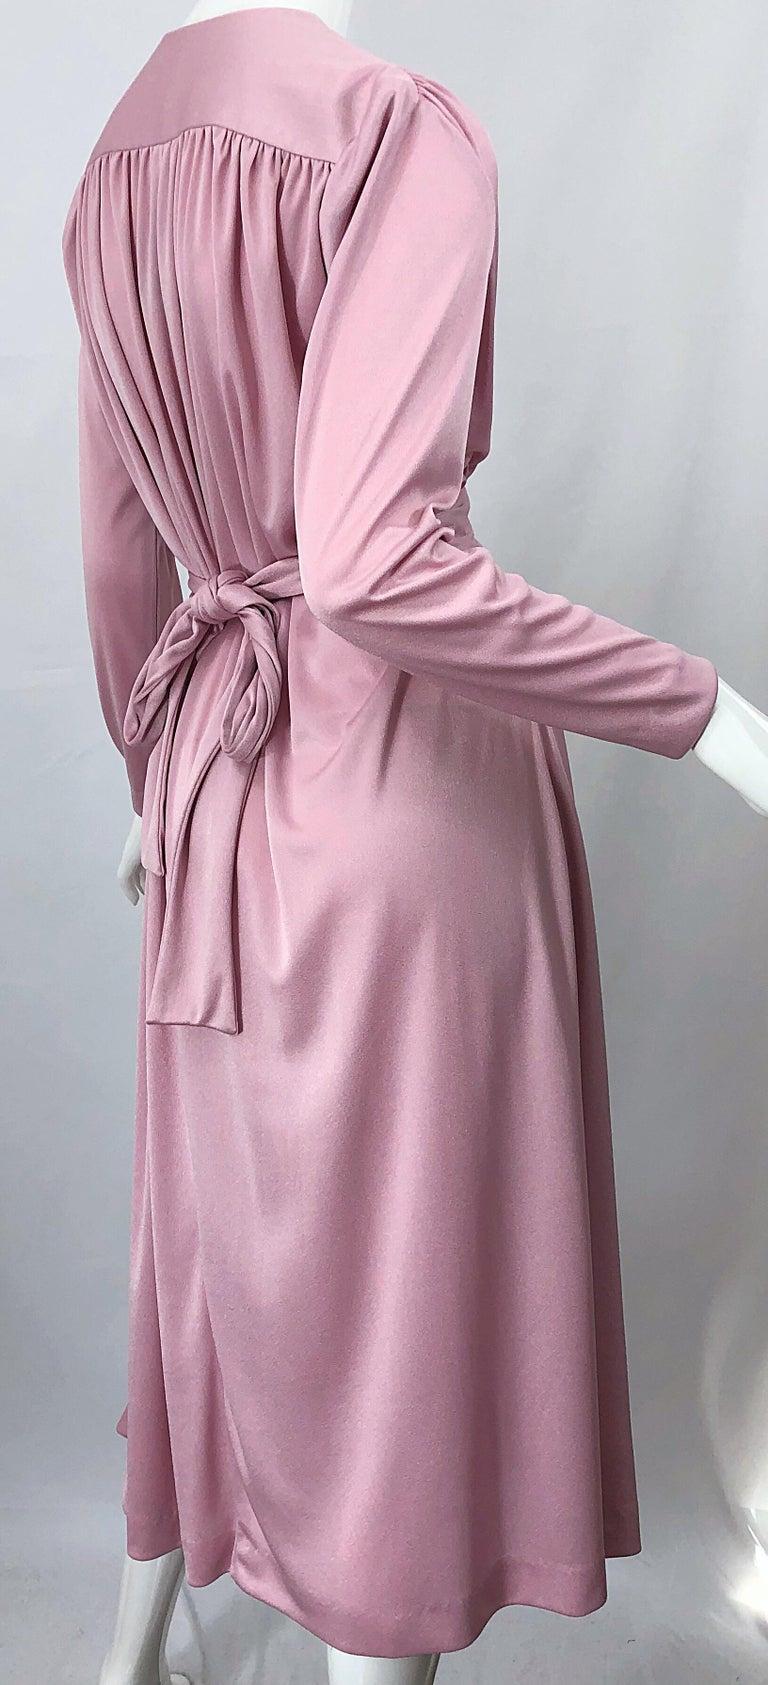 Joy Stevens 1970s Pink Mauve Dusty Rose Long Sleeve Disco Vintage 70s Dress For Sale 7